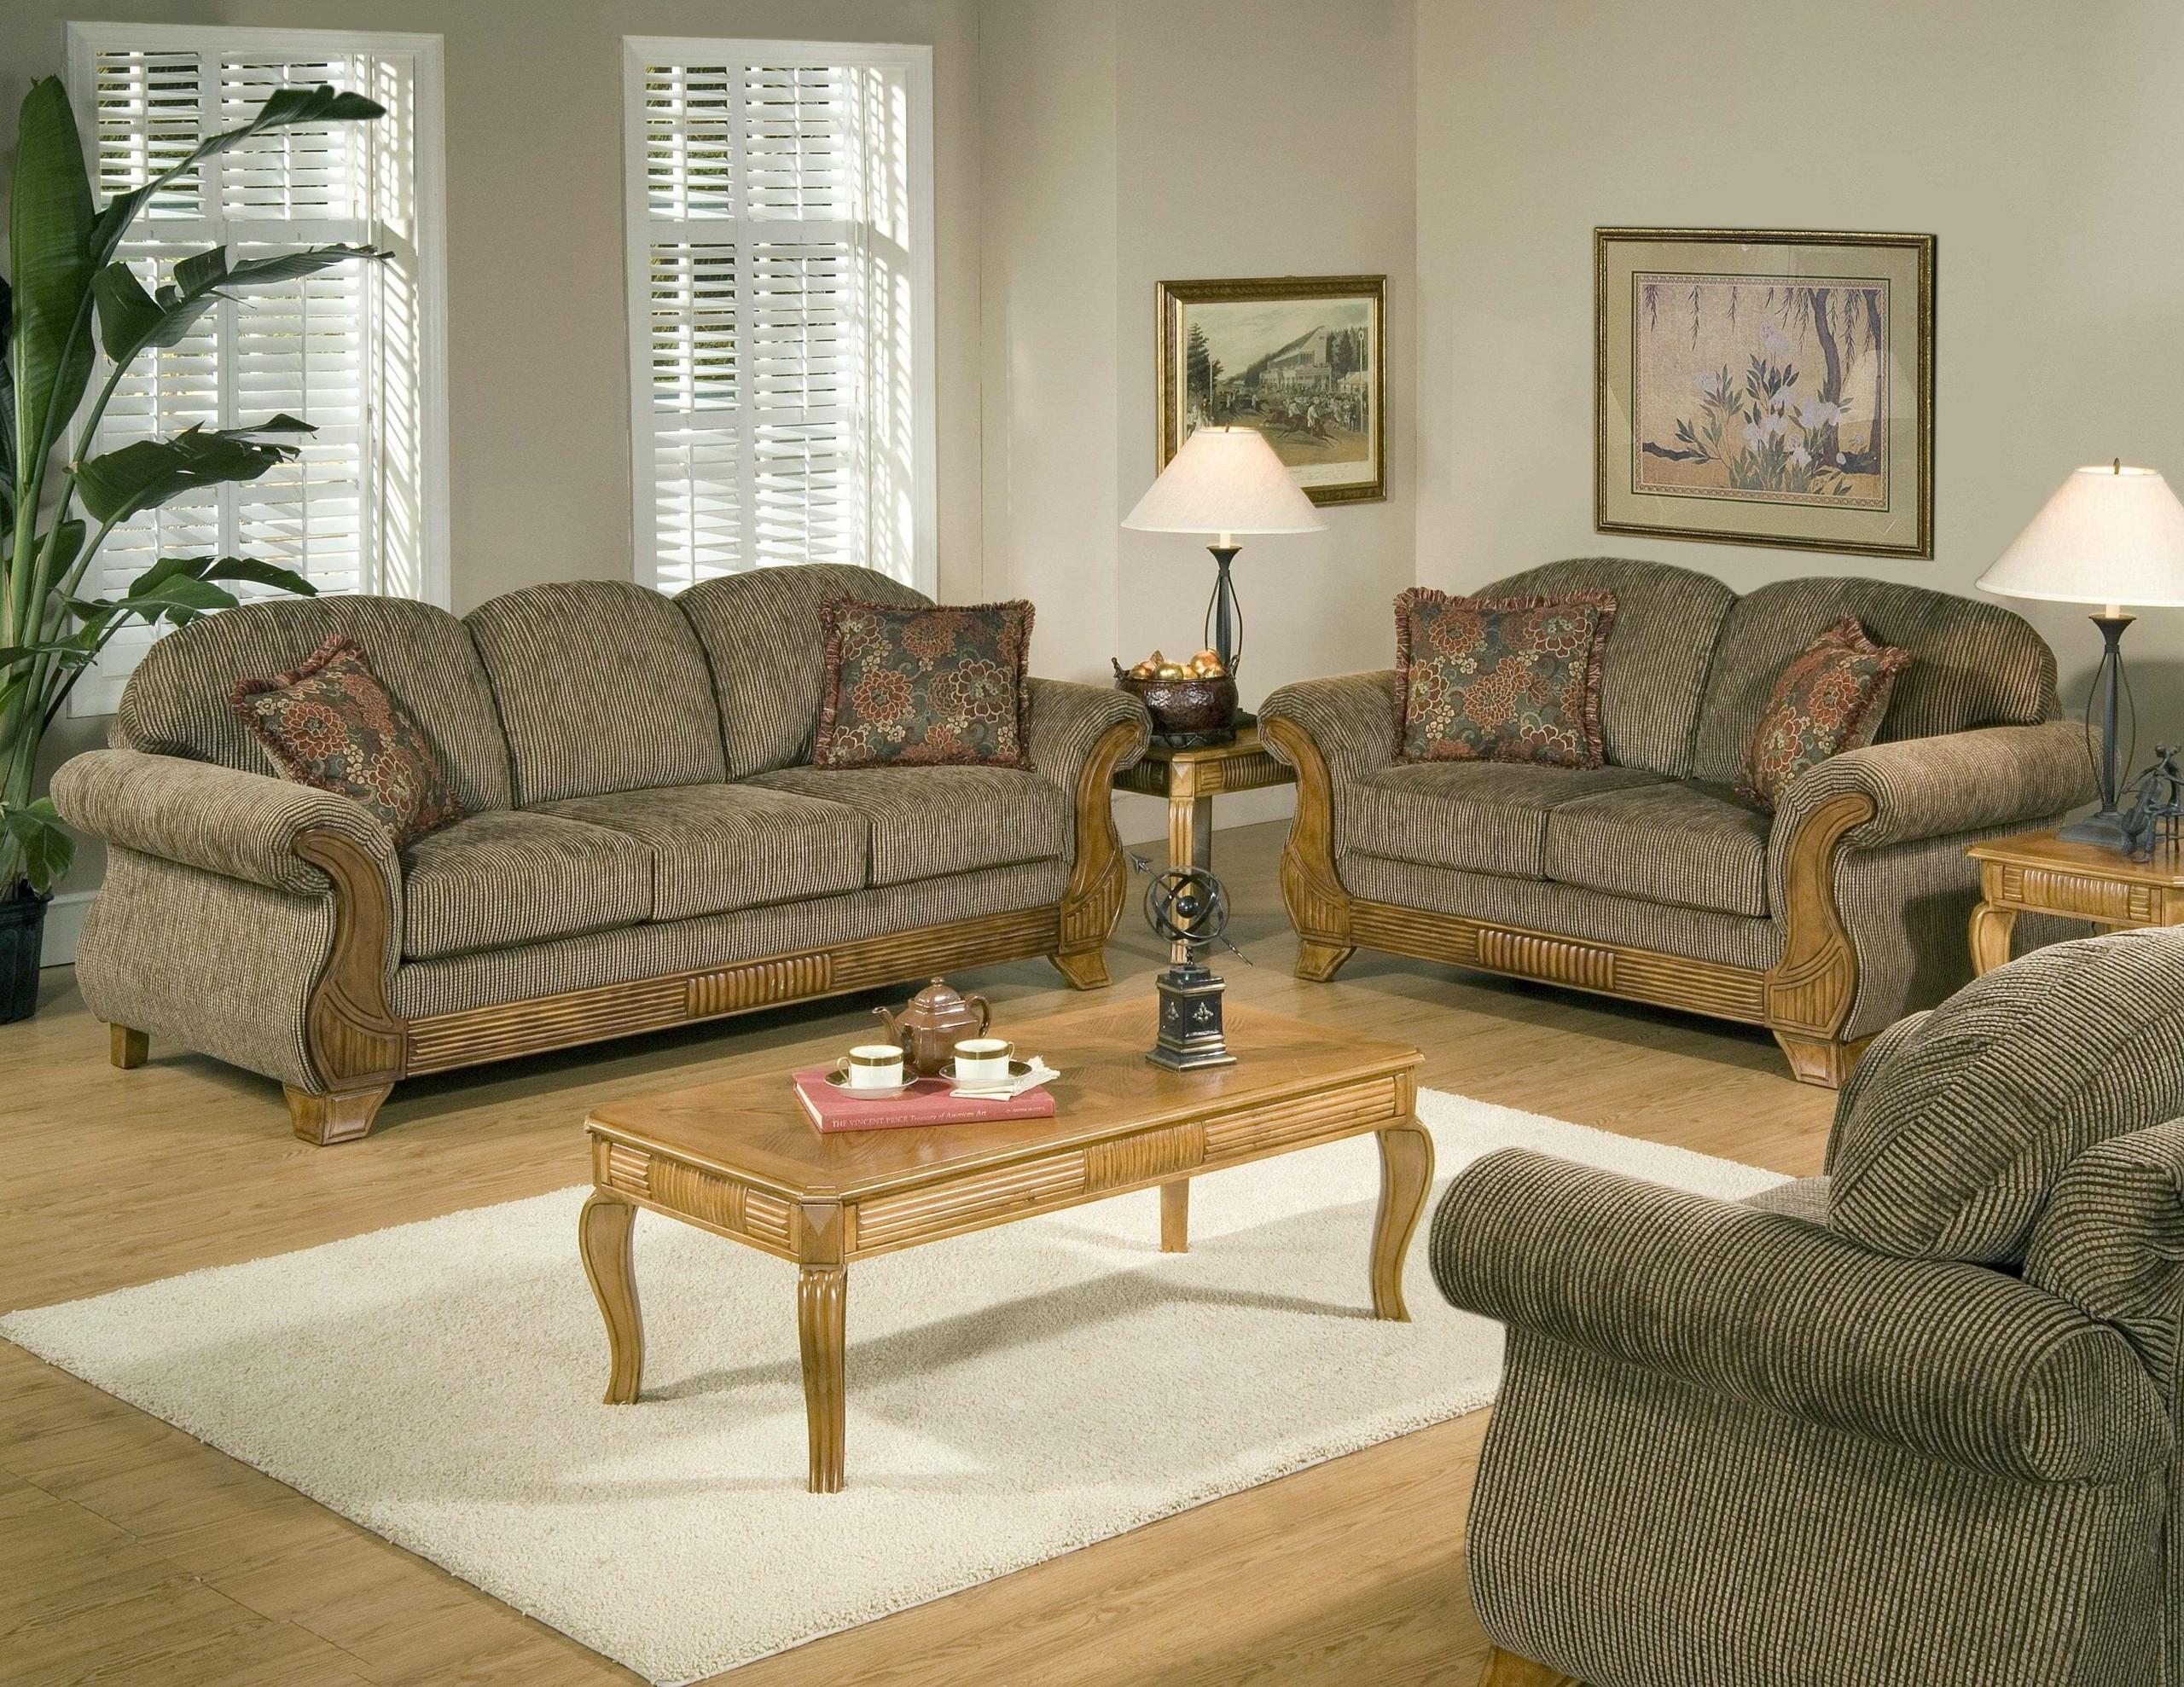 https://foter.com/photos/371/living-room-set-5.jpg